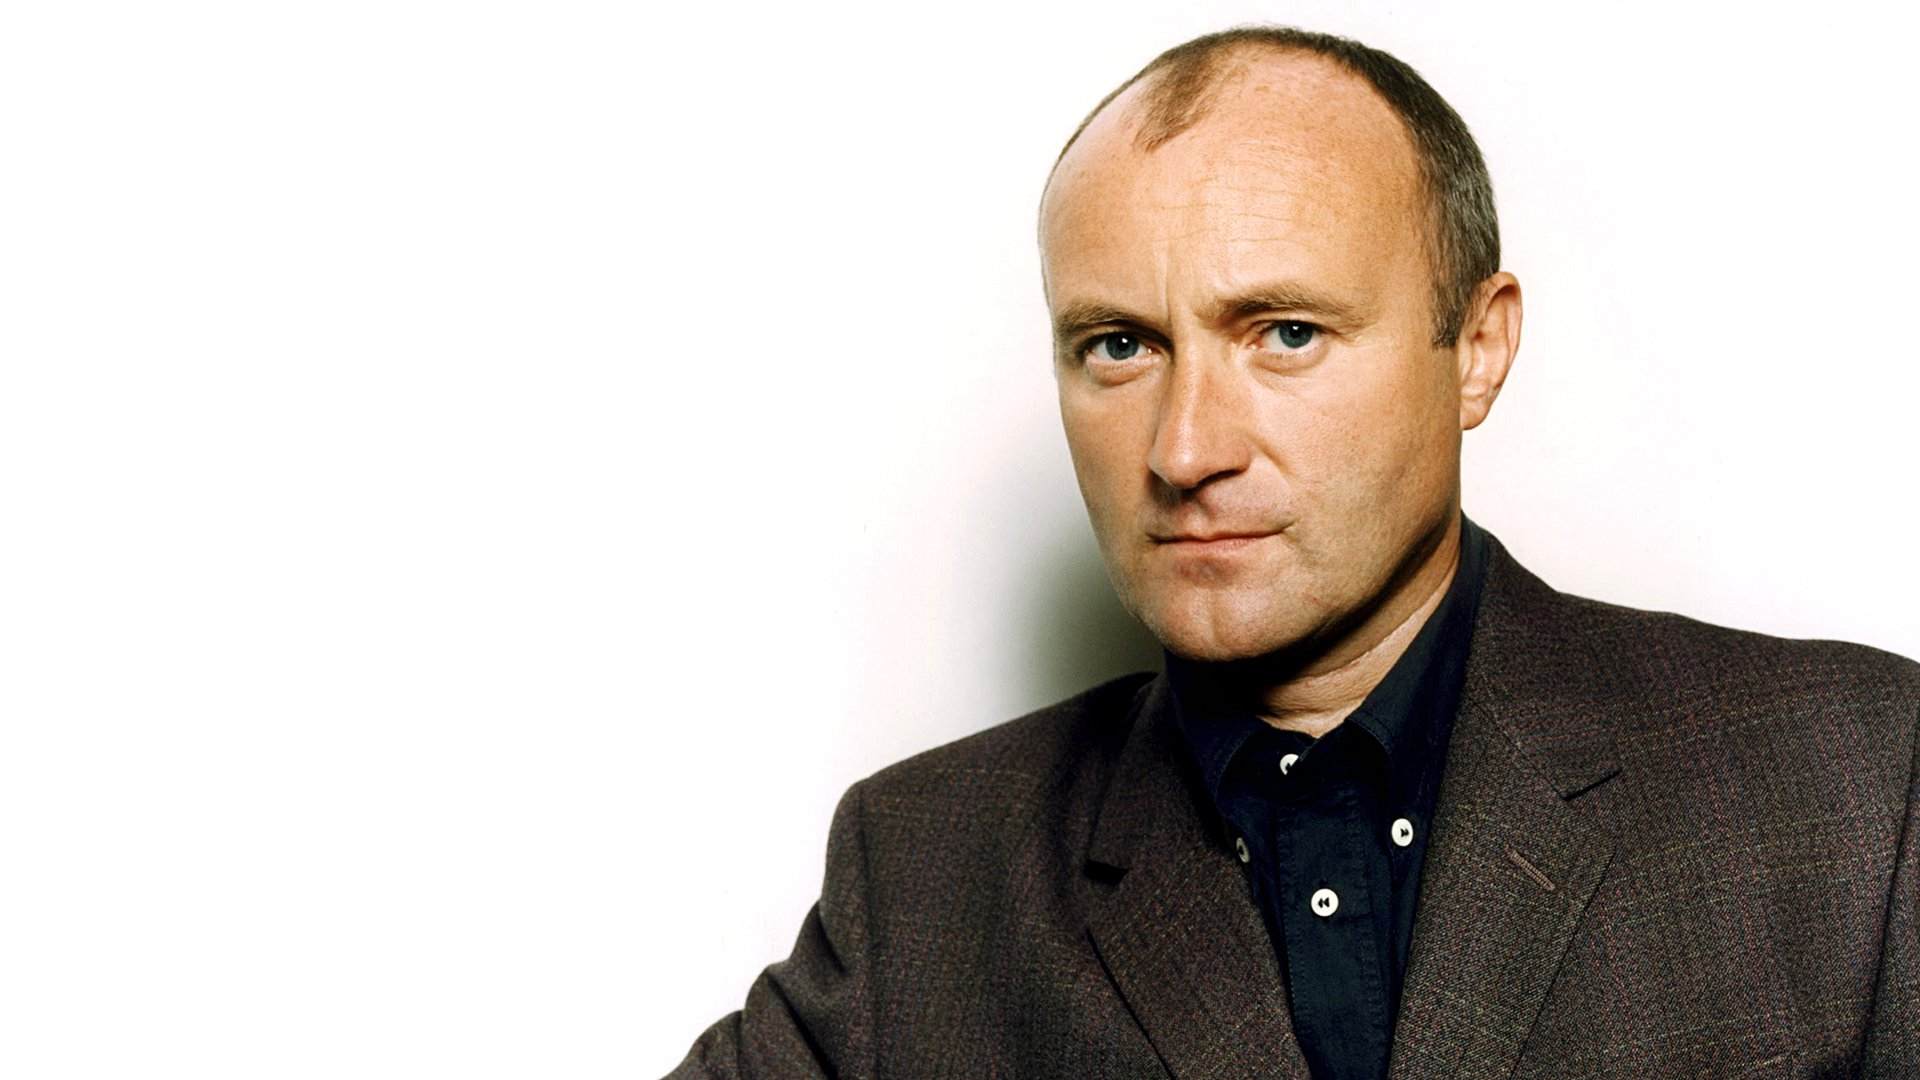 Phil Collins inizia il suo tour in Brasile facendosi arrestare!